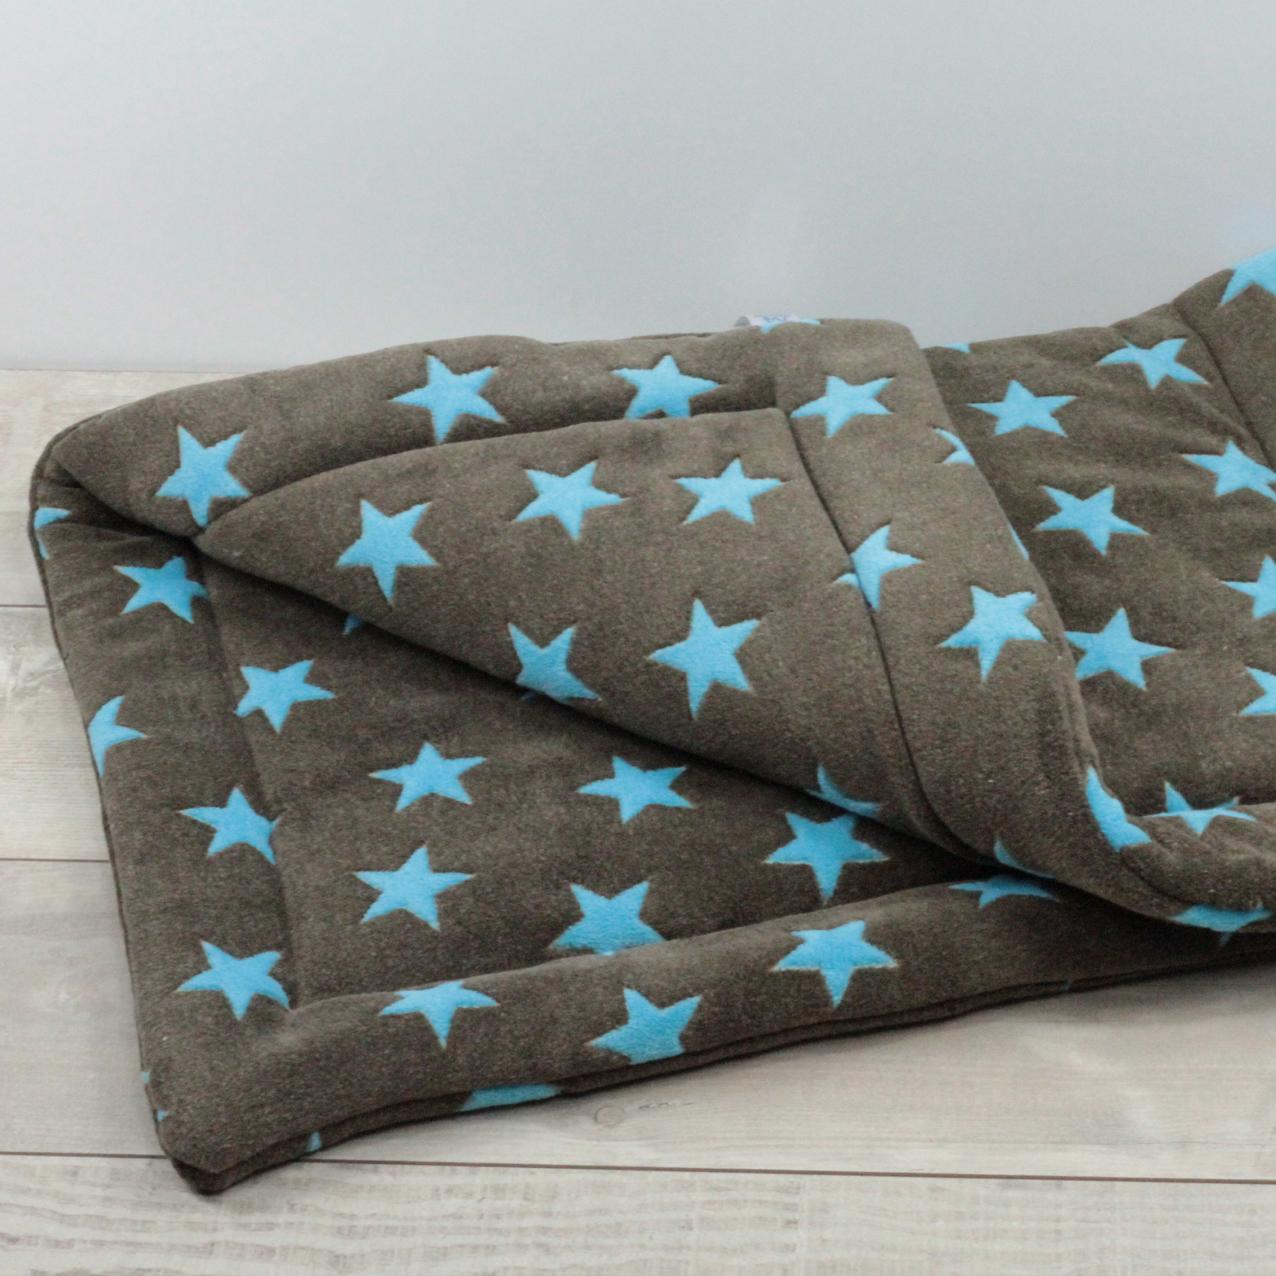 Decke Stars.Matdox Fleece Decke Stars Braun Turkis Der Hundsladen